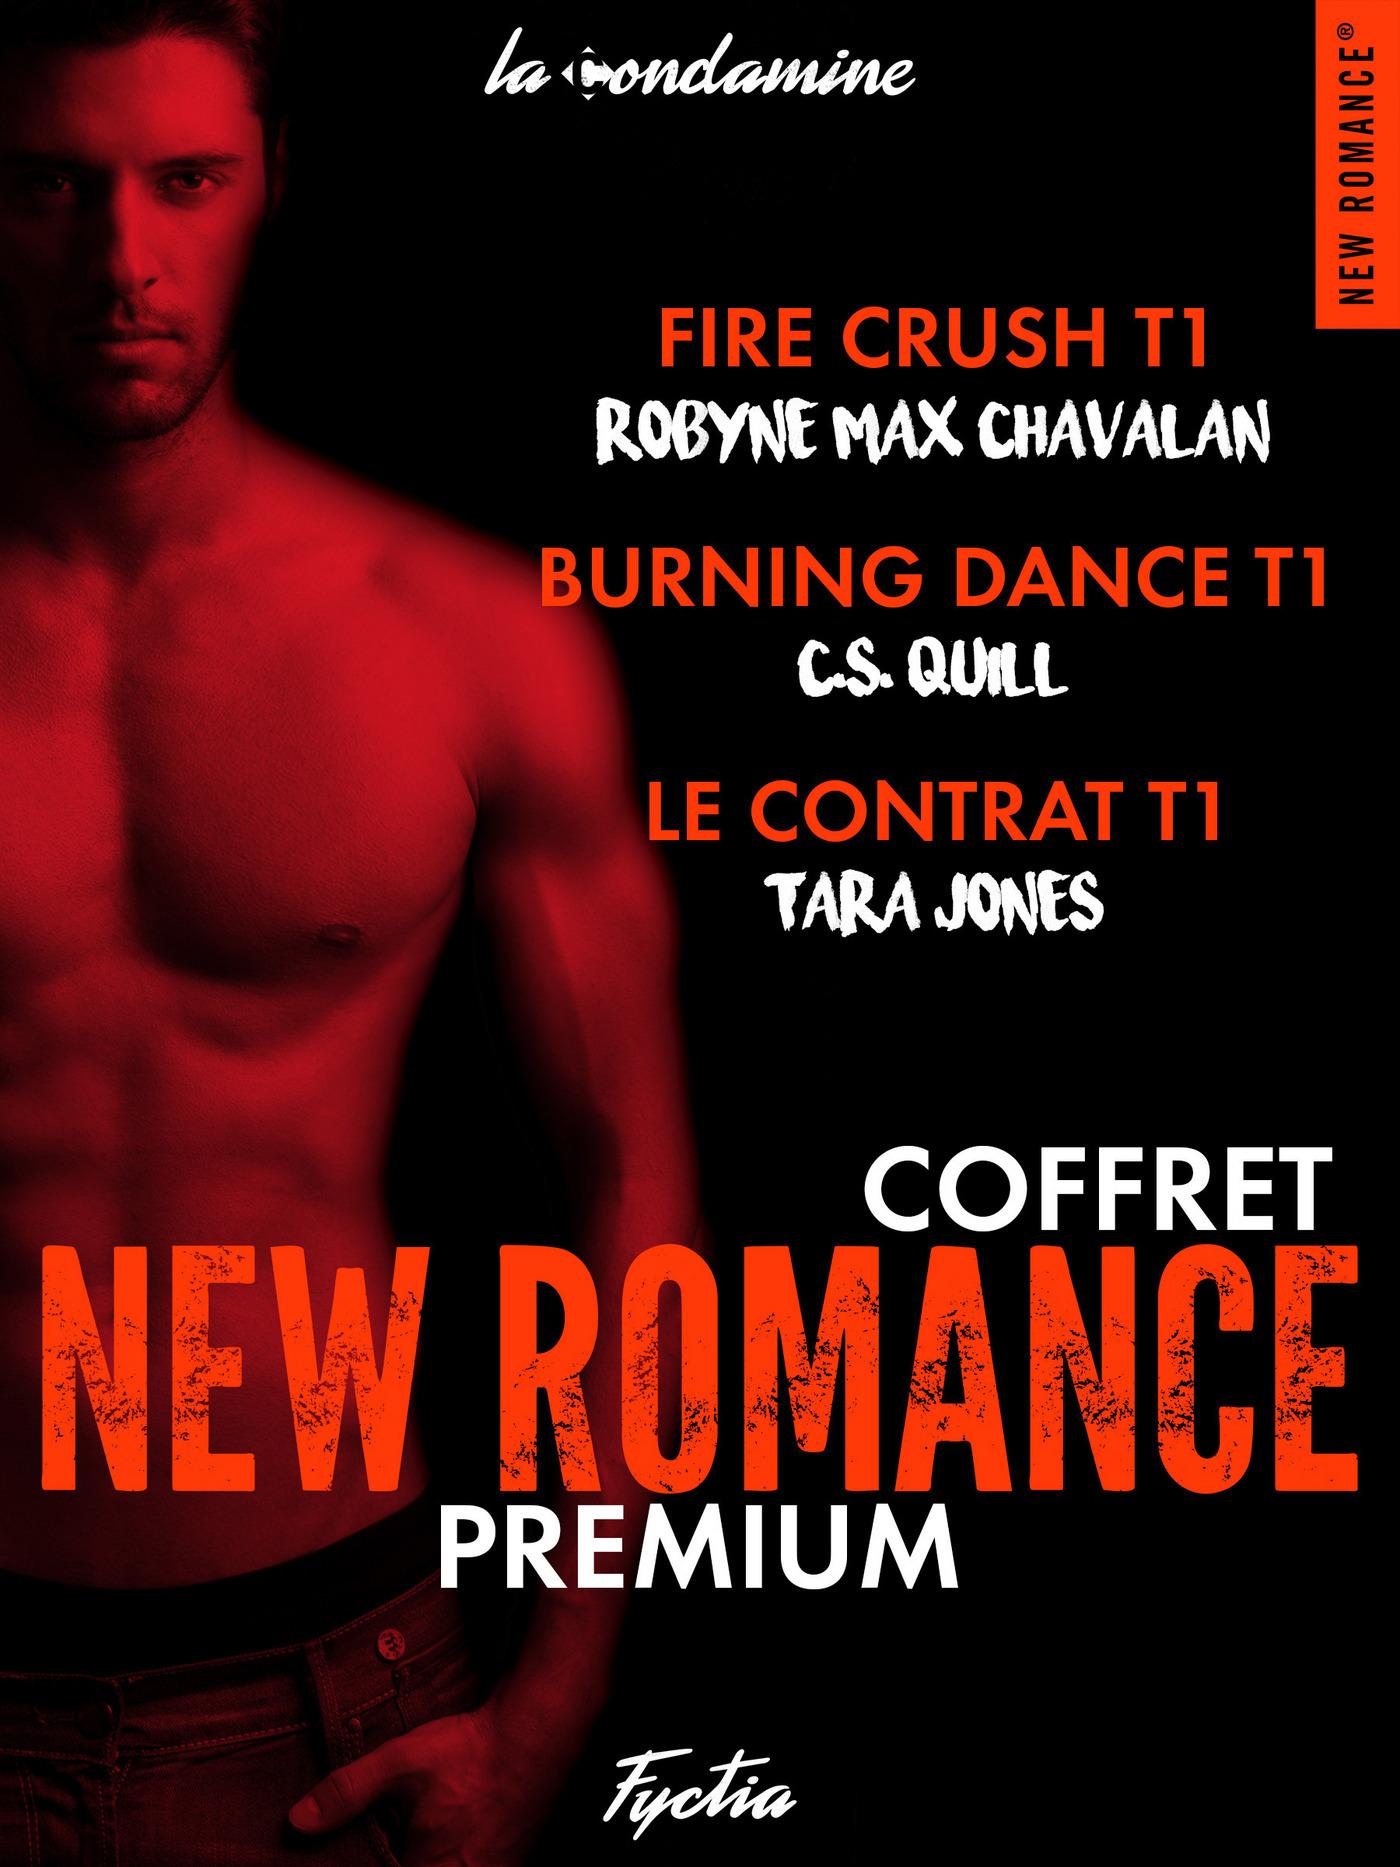 Coffret New Romance Premium